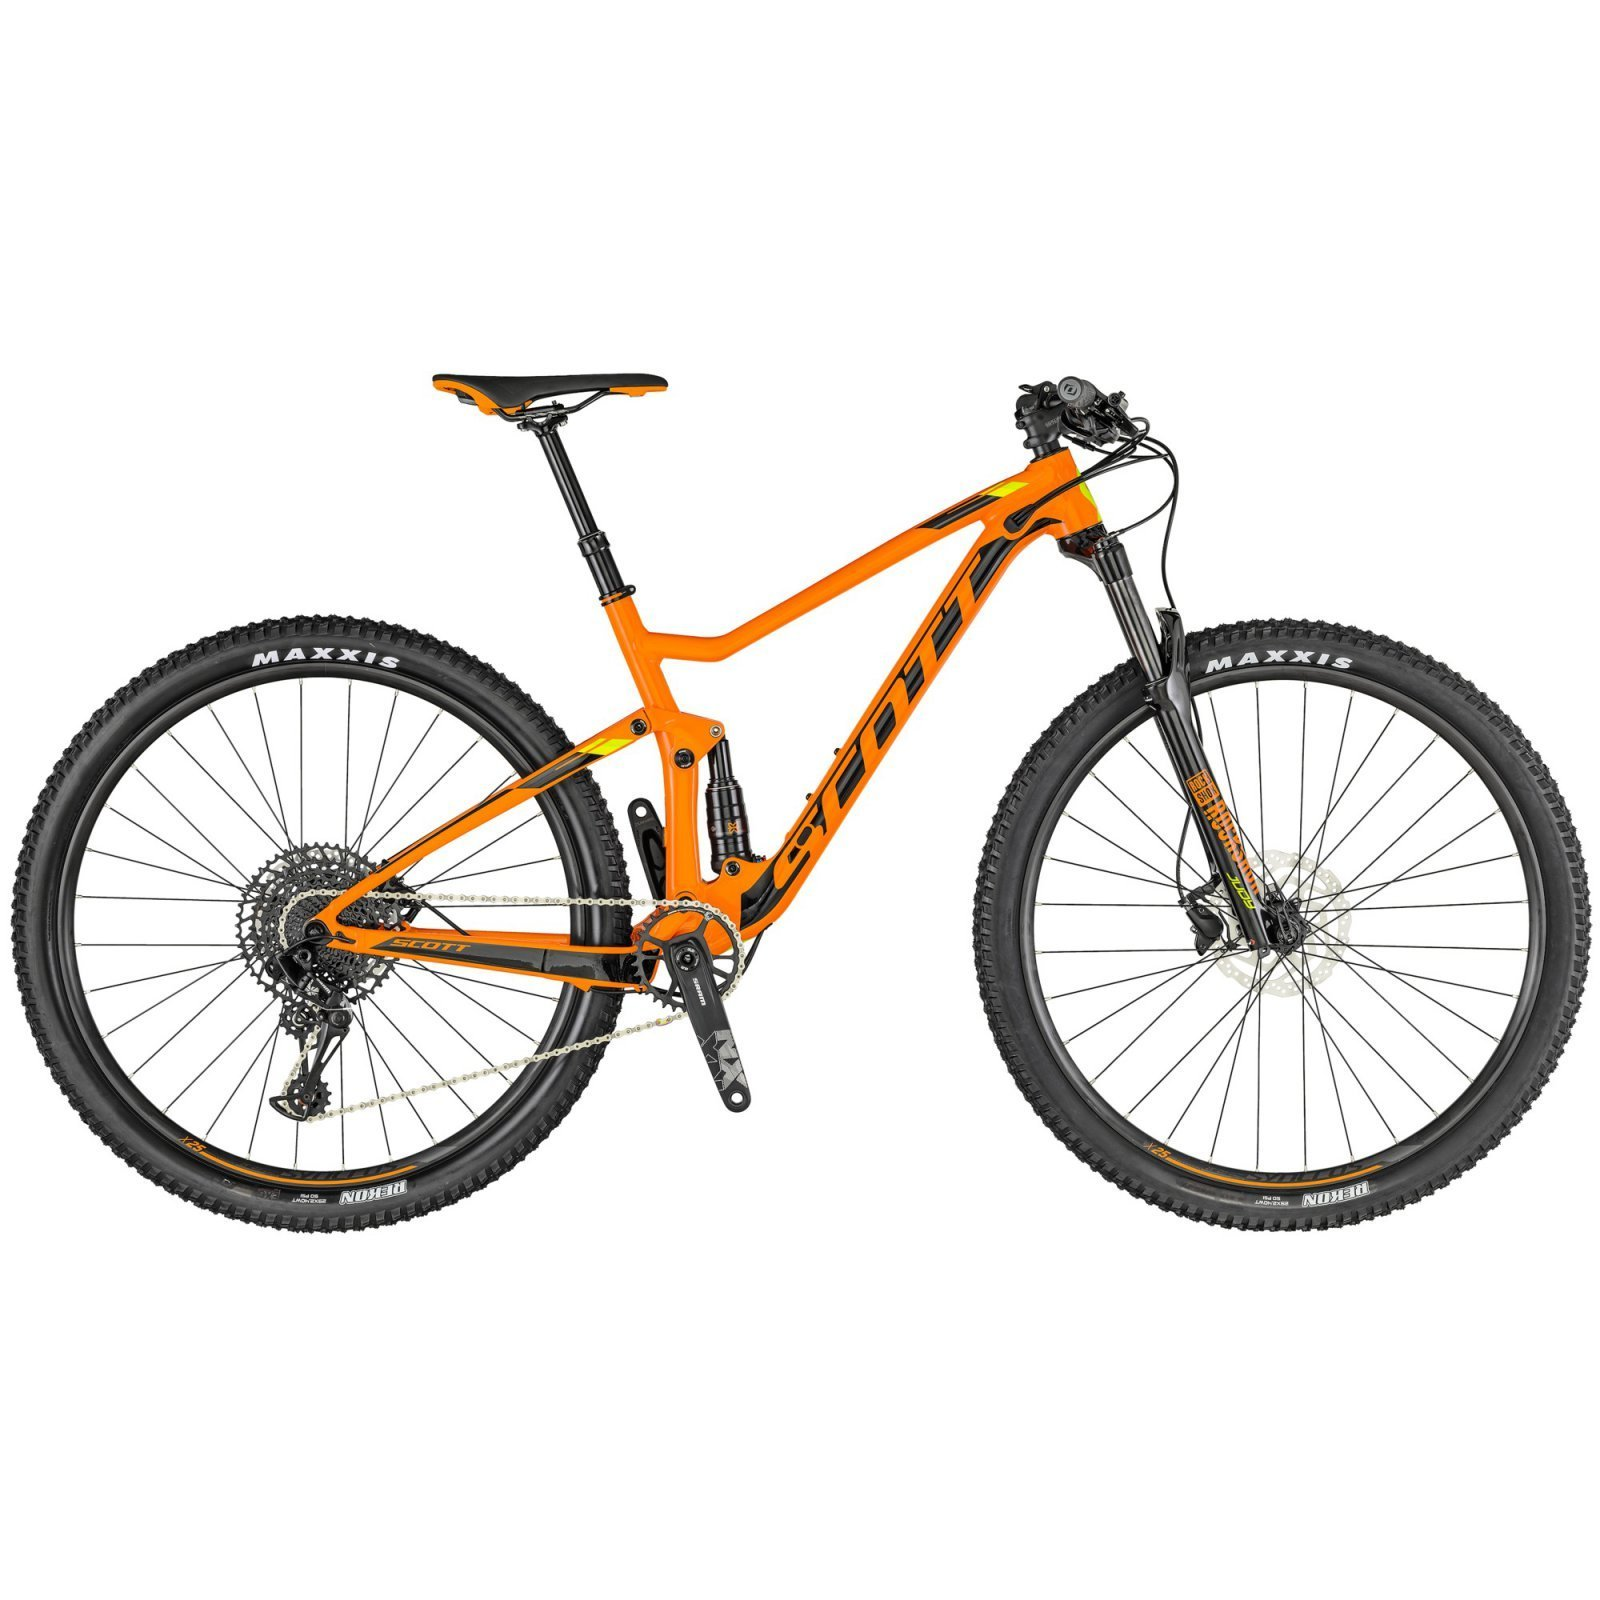 Bicicleta Scott Spark 960 2019